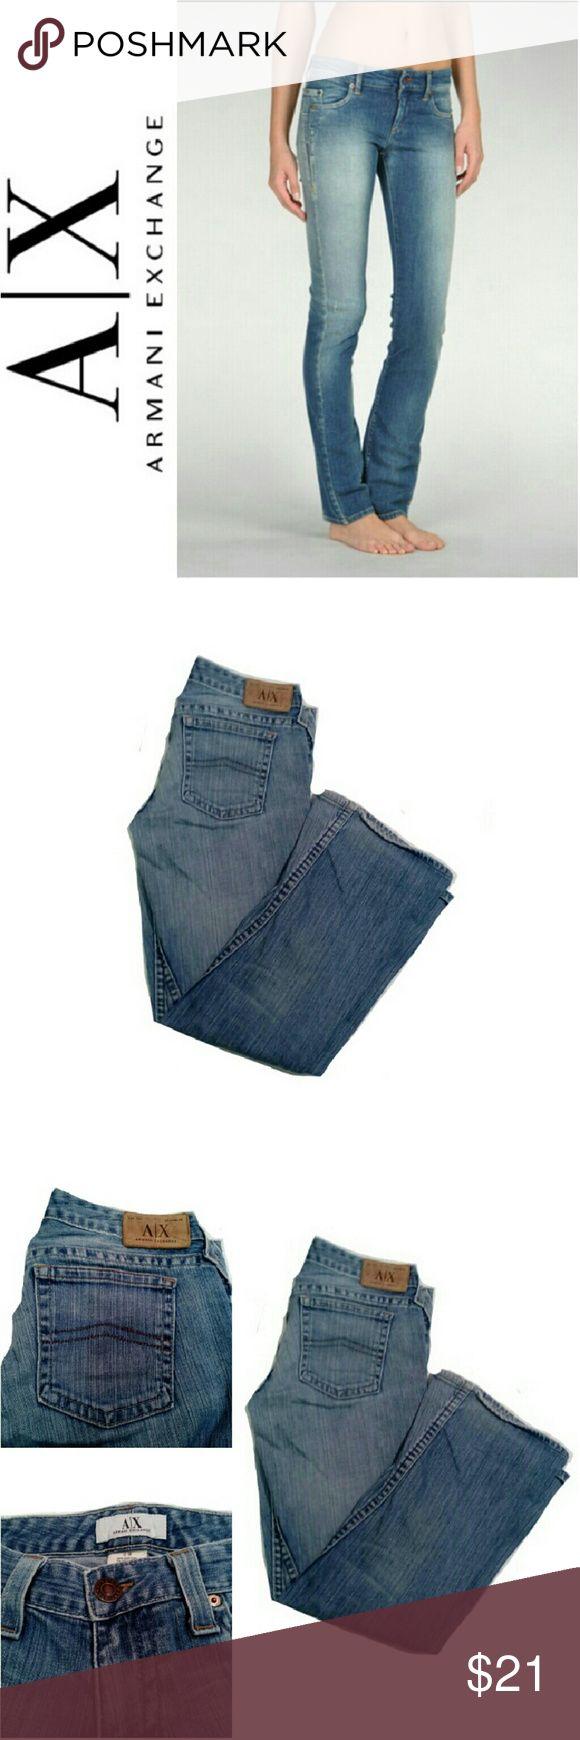 "ARMANI EXCHANGE BOOT CUT JEANS - SHORT ARMANI EXCHANGE BOOT CUT JEANS Pre-Loved  *.  Classic Boot Cut Jeans *.  Size 6 Short *.  W 31"" L 29"" Armani Exchange Jeans Boot Cut"